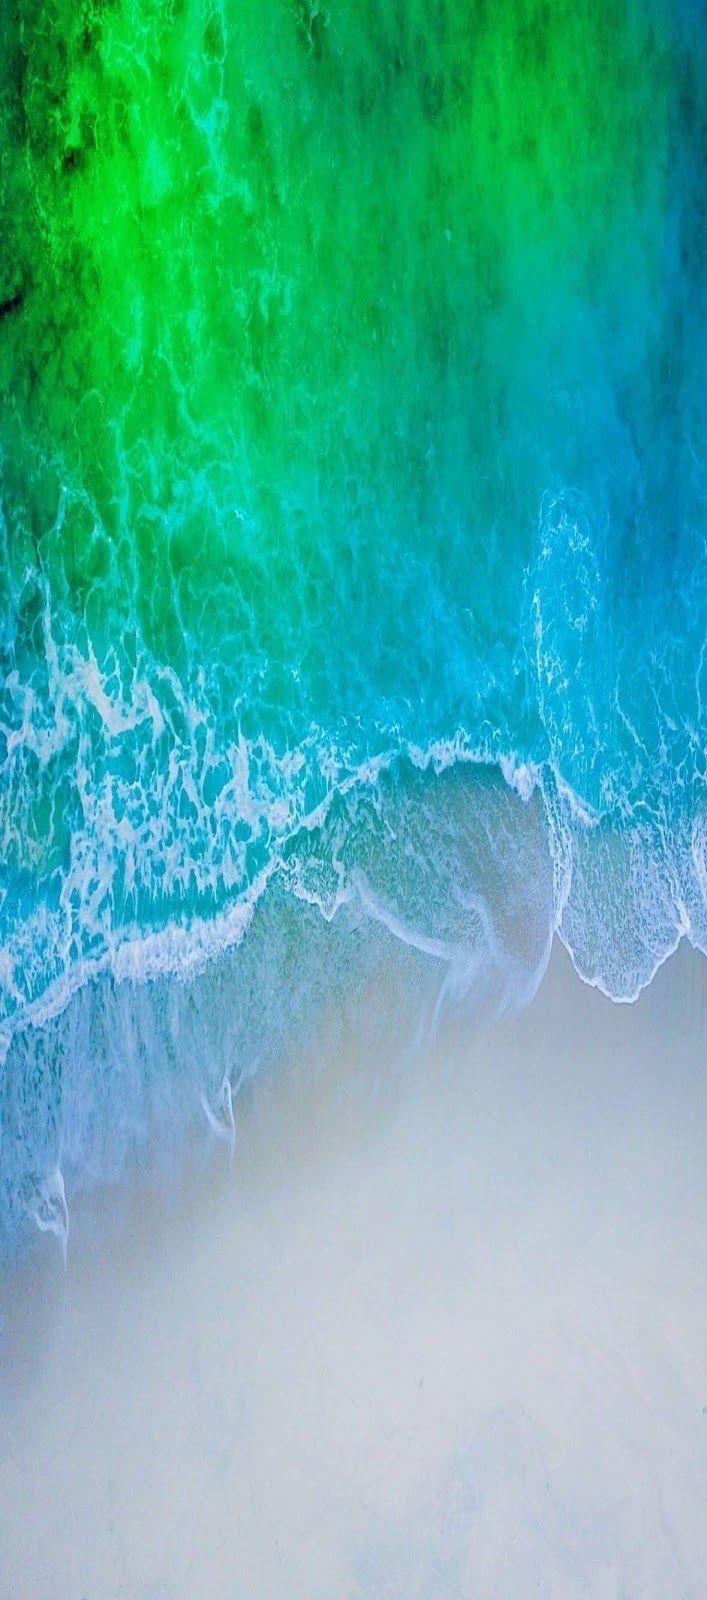 Pin On Iphone 11 Wallpaper Ios 11 Wallpaper Iphone Wallpaper Ocean Iphone Wallpaper